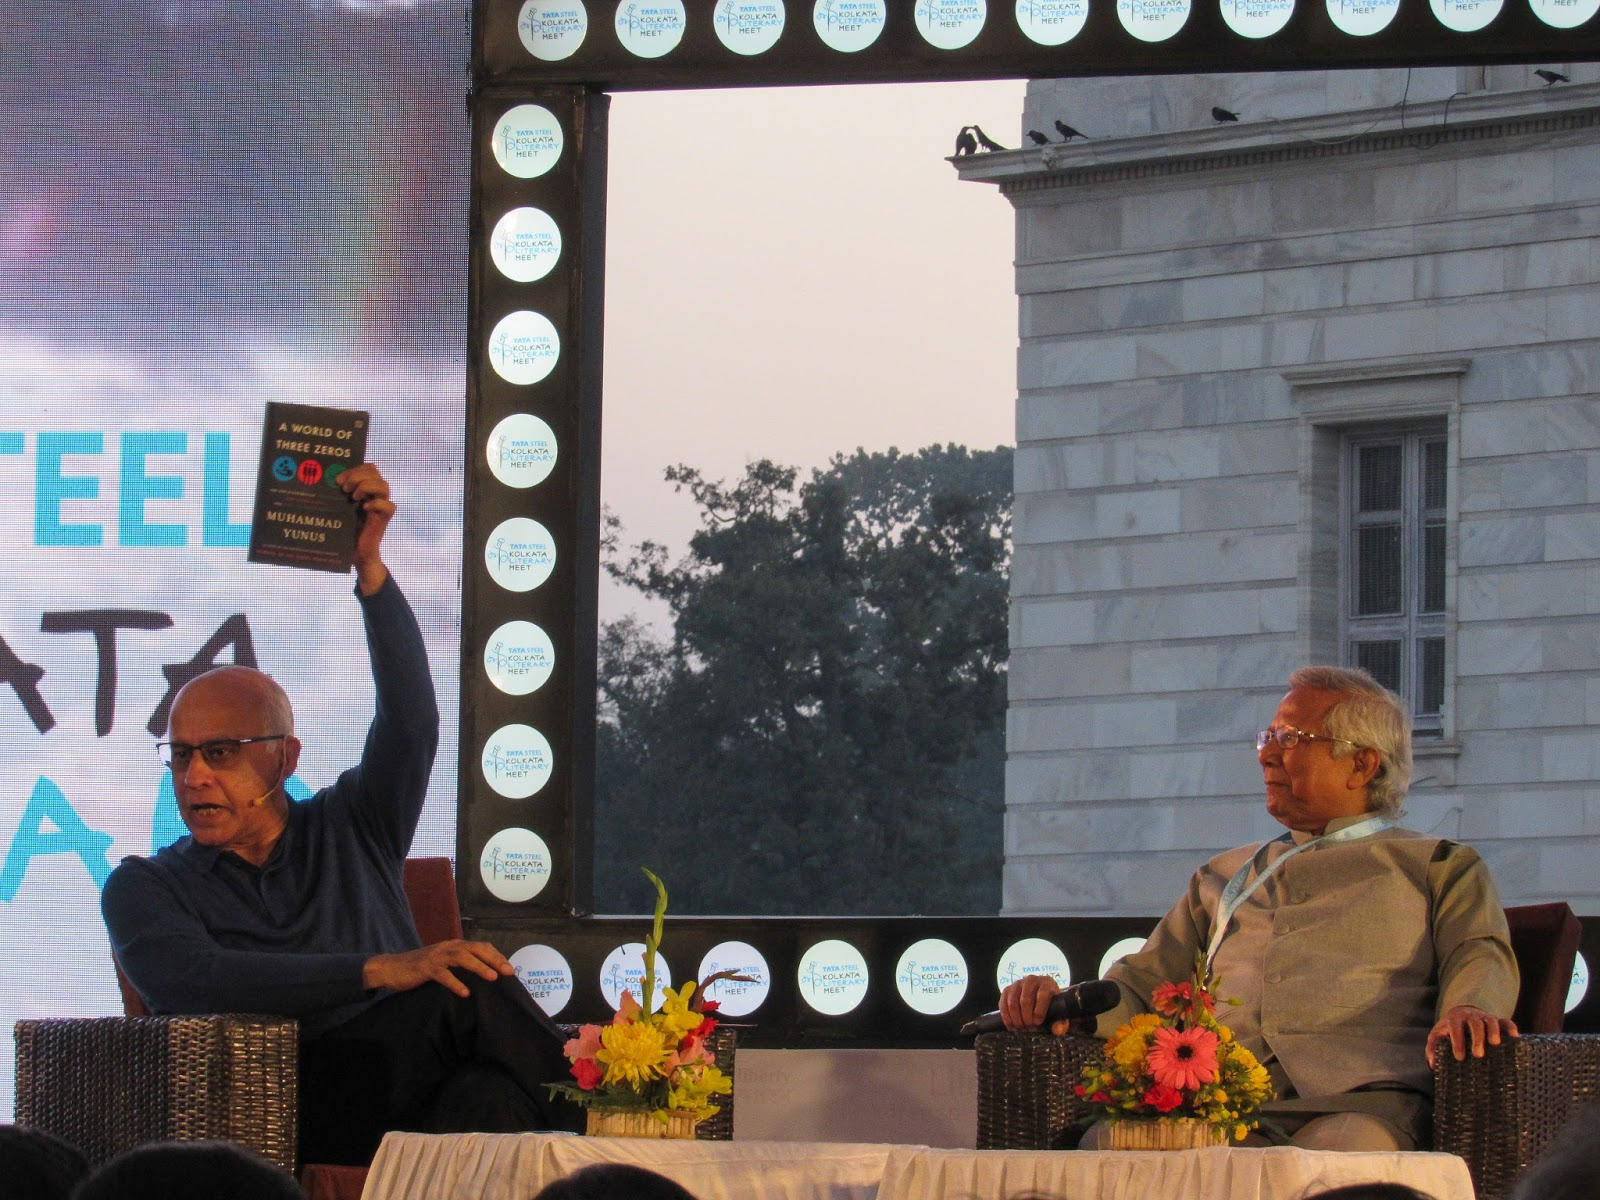 Muhammad Yunus - tata steel kolkata literary meet 2018 - subroto bagchi